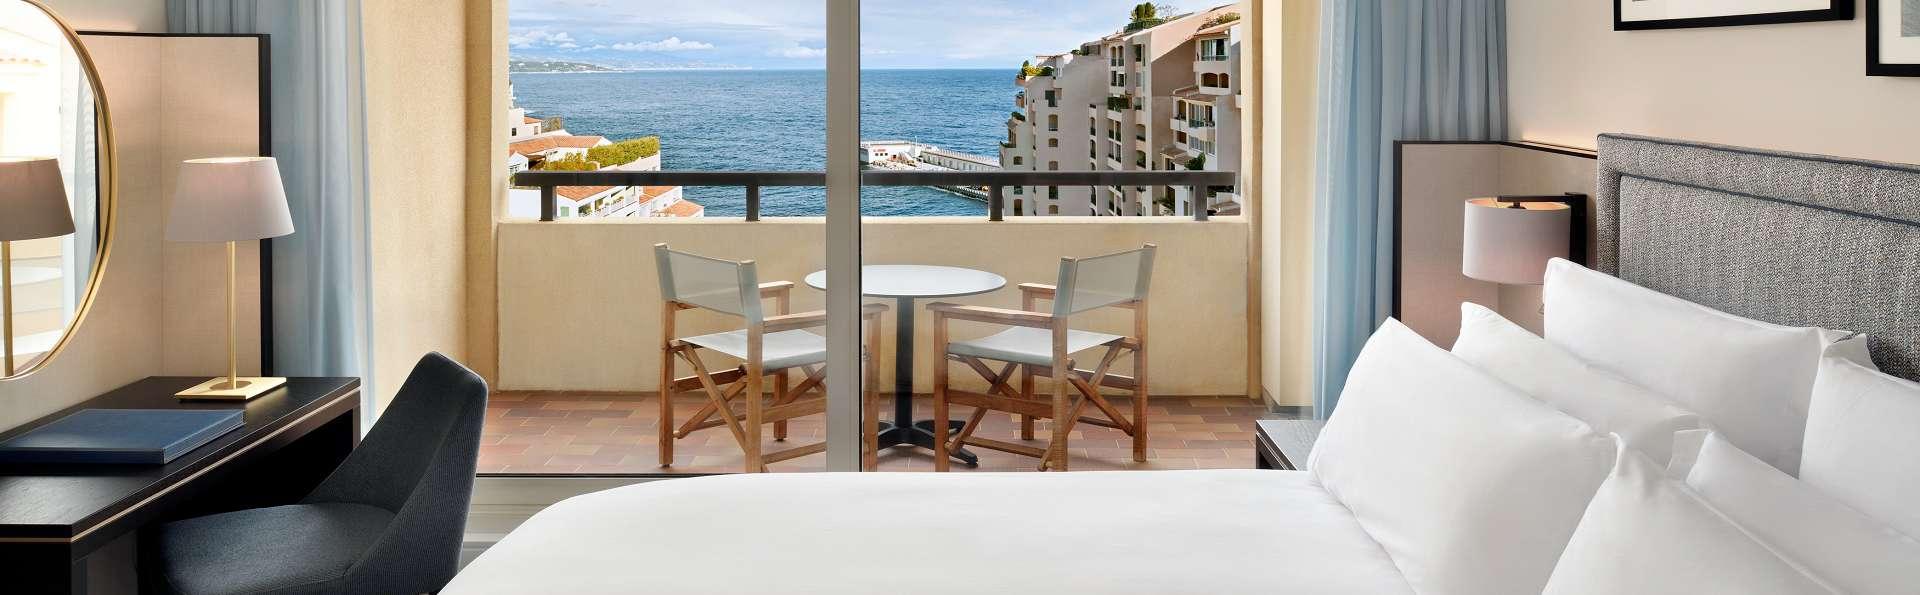 Week-end en chambre deluxe avec vue mer à Monaco